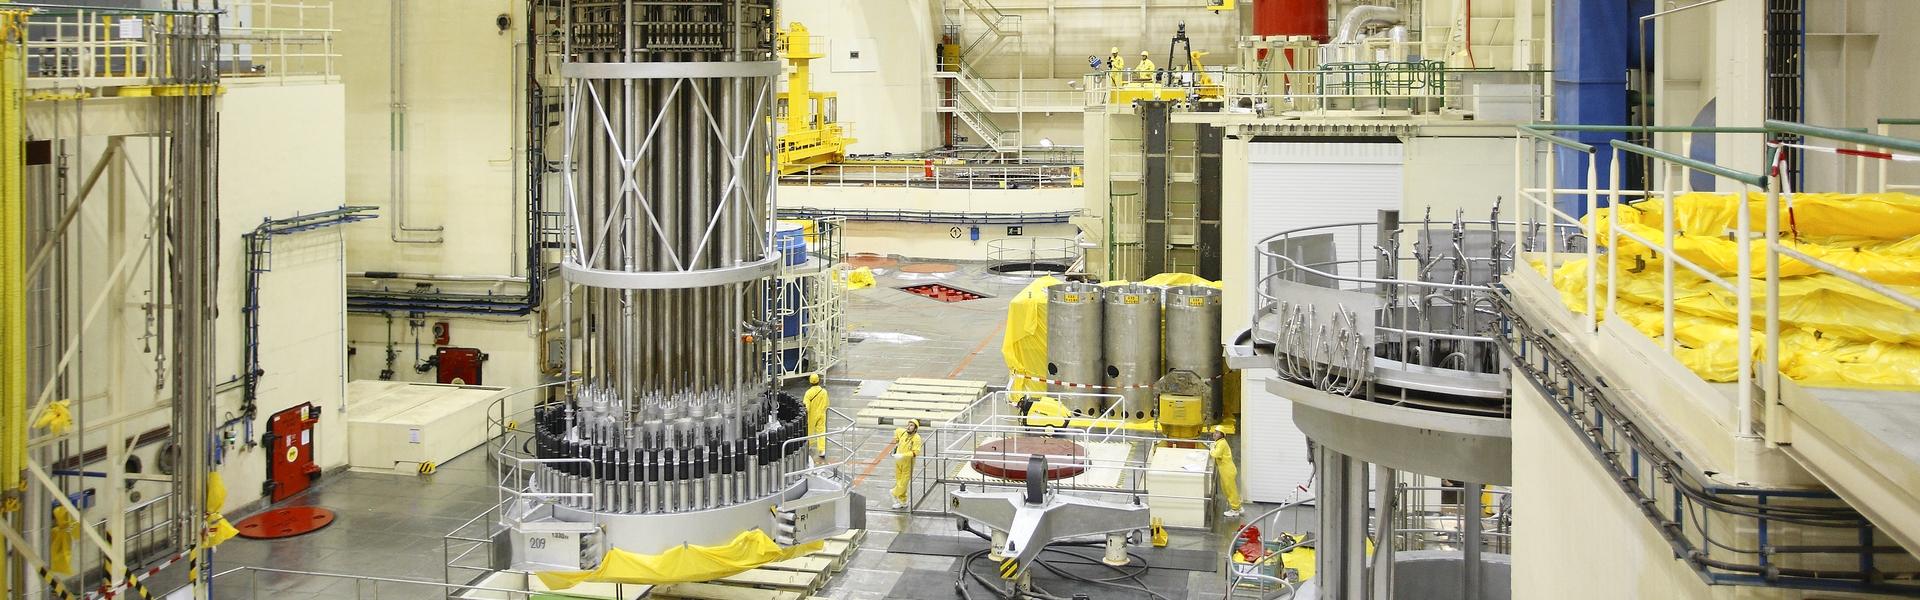 Maintenance of reactor building logical units